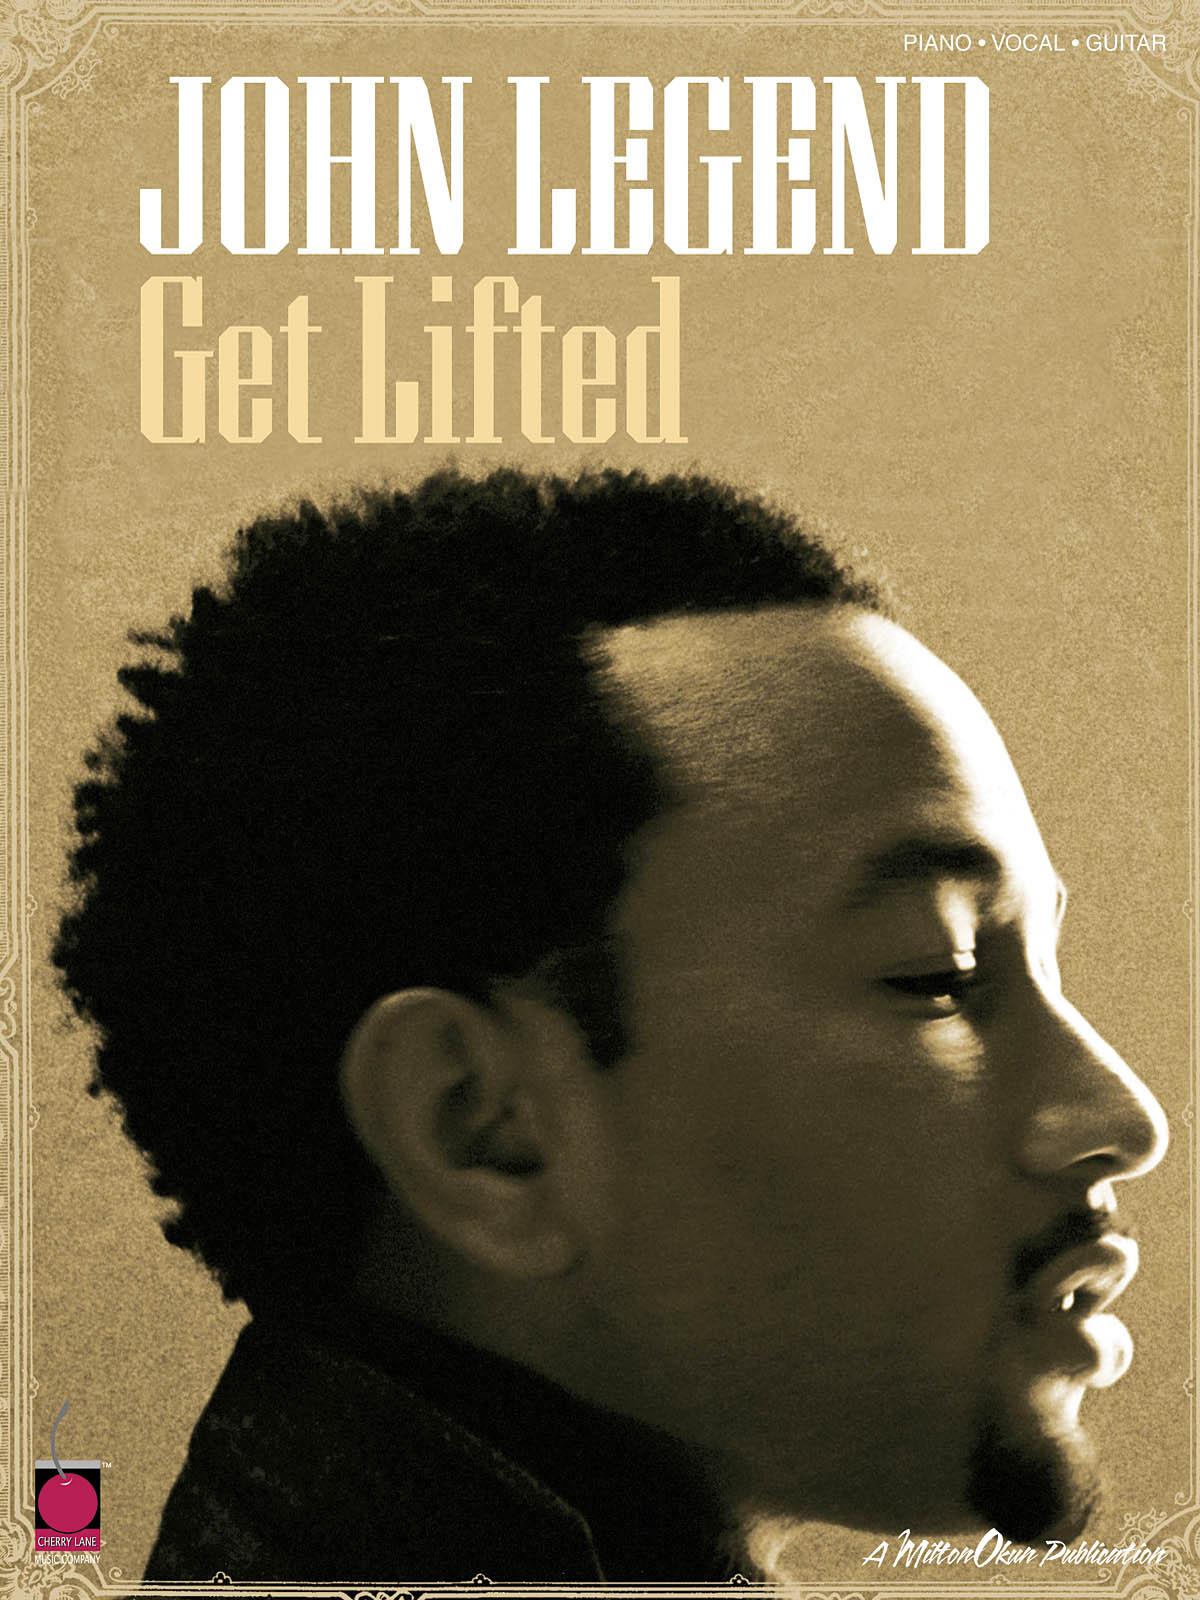 John Legend: John Legend - Get Lifted: Piano  Vocal and Guitar: Album Songbook